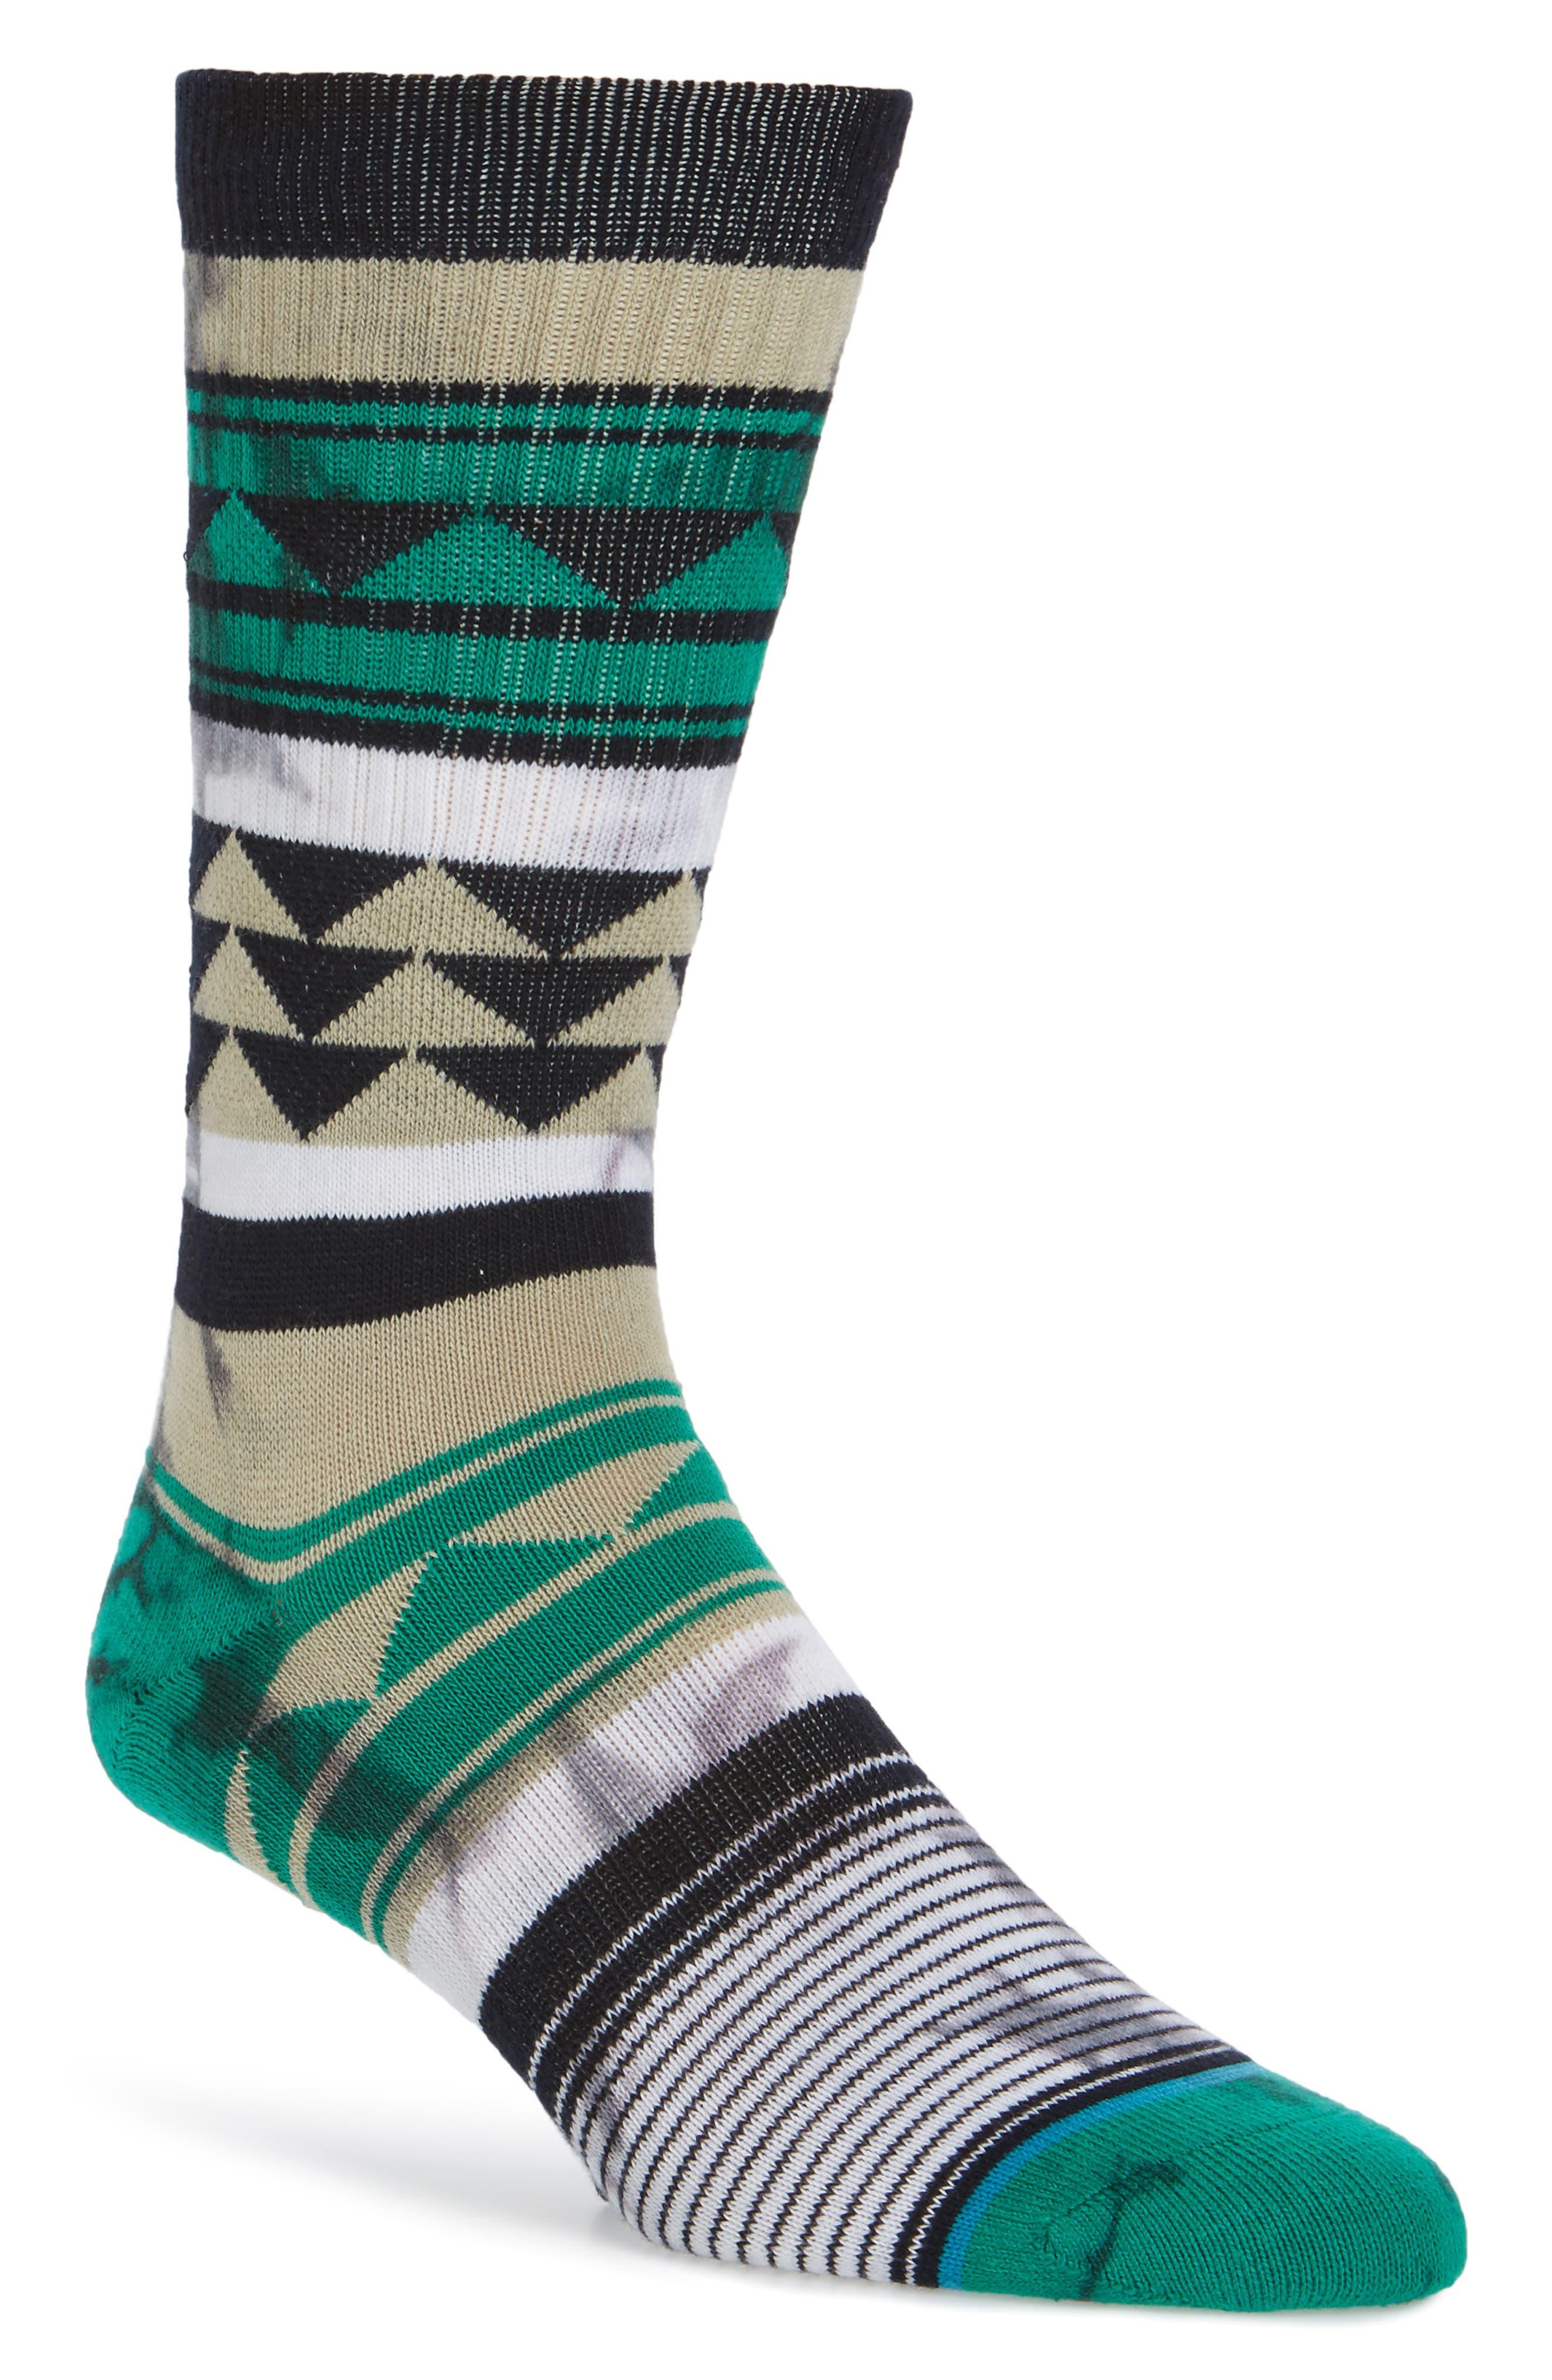 Stance Pachuca Crew Socks